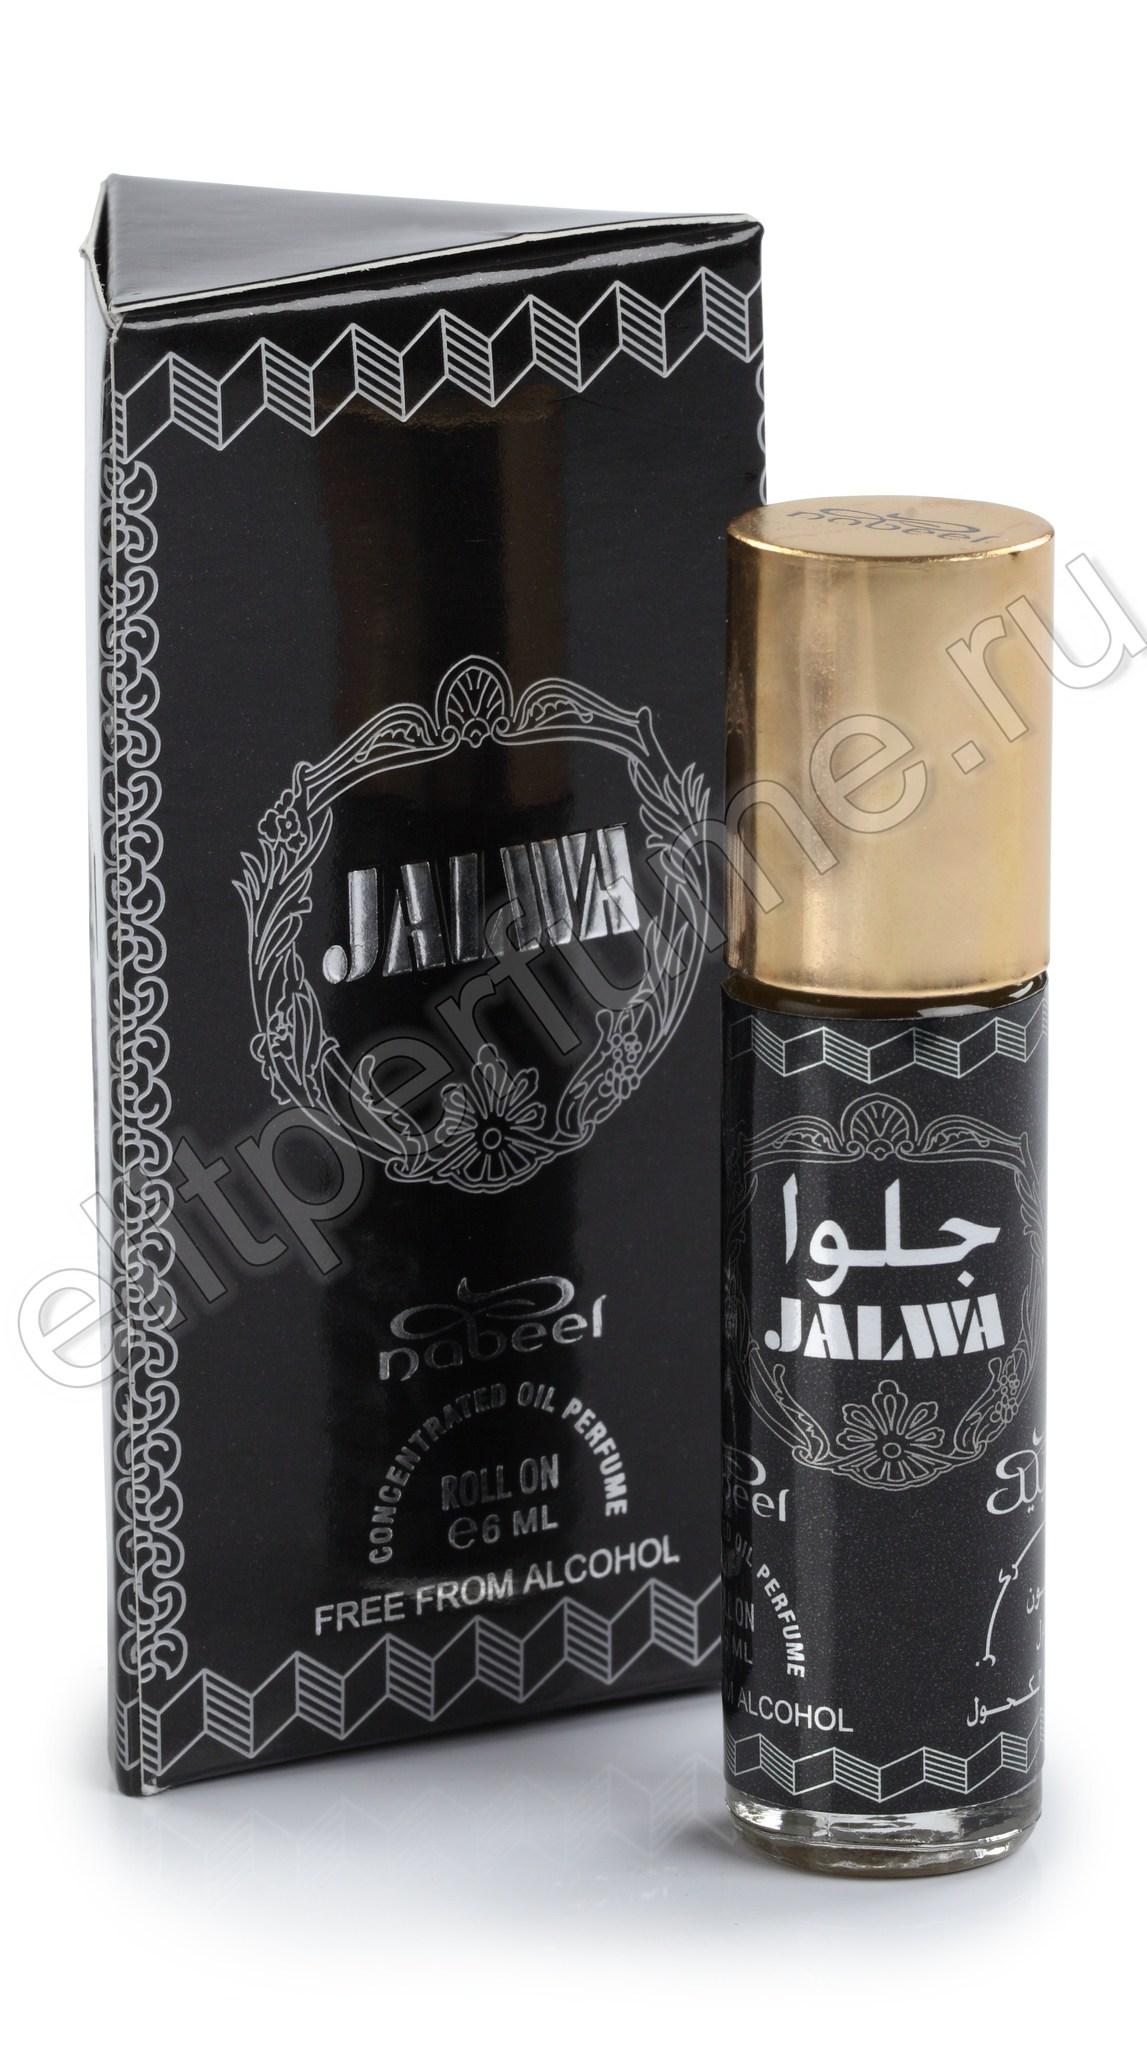 Джалва Jalwa 6 мл арабские мужские масляные духи от Набиль Nabeel Perfumes